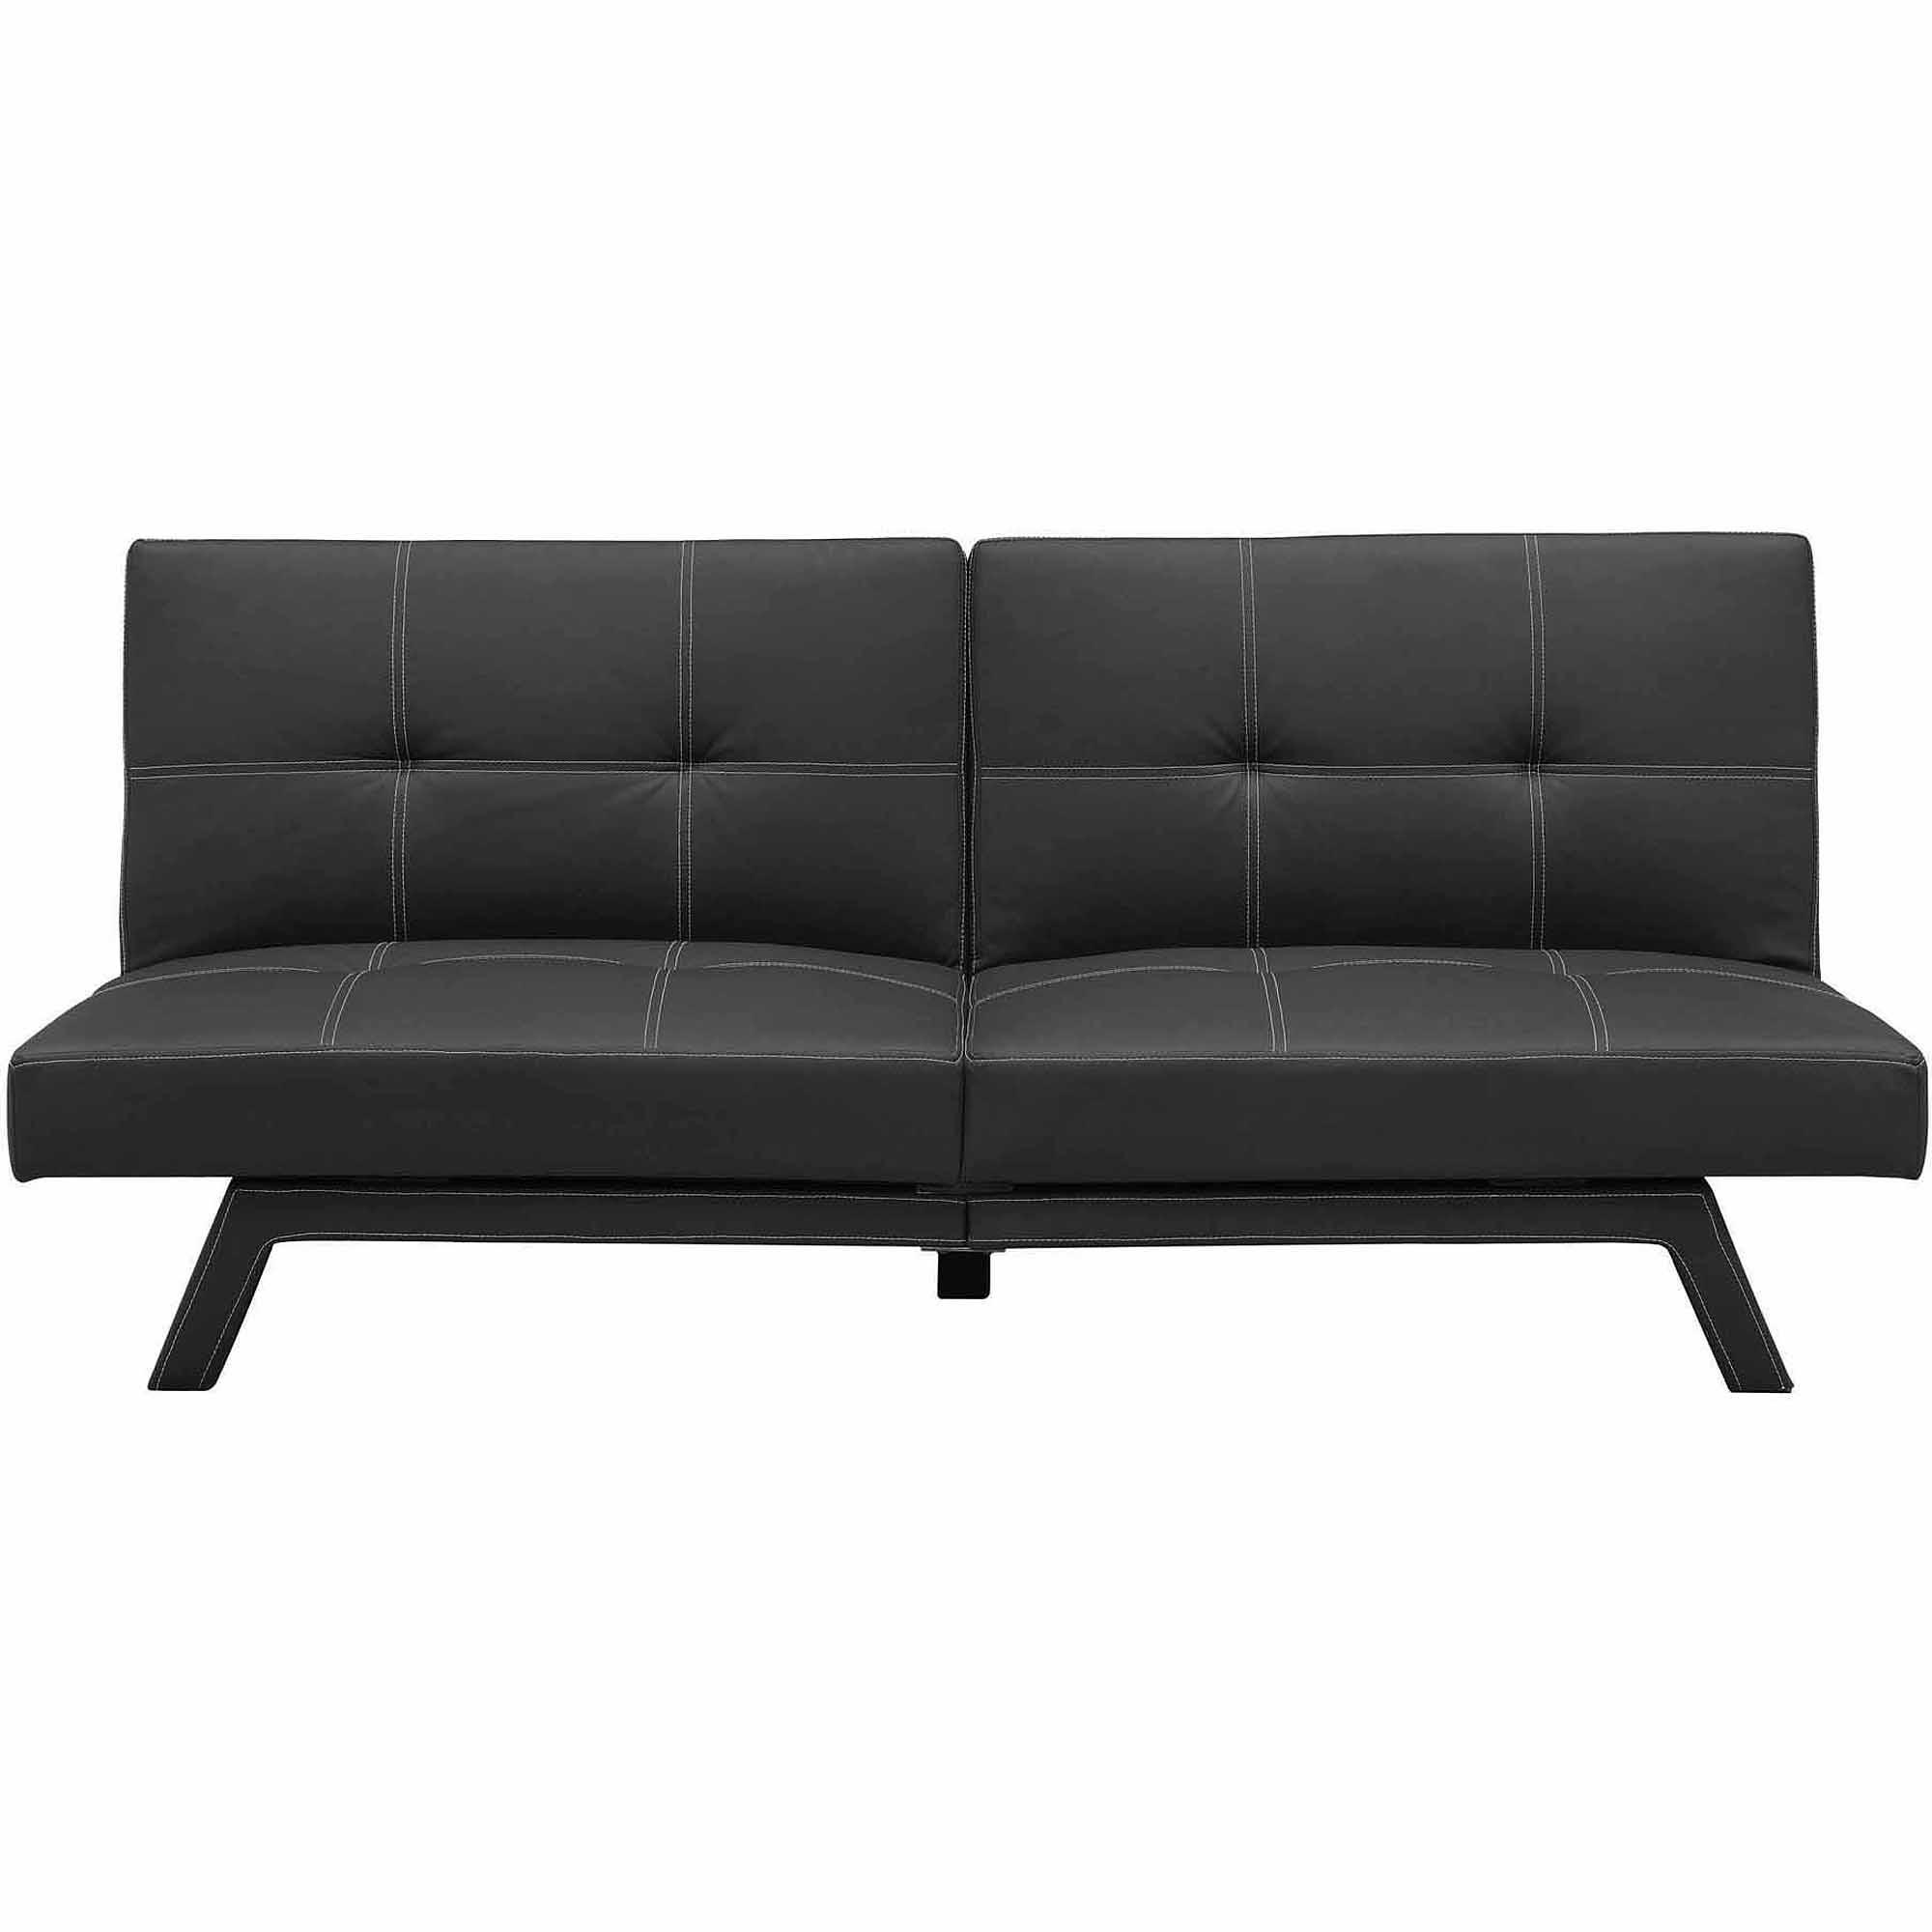 Furniture: Leather Futon Walmart | Futons At Kmart | Futon Full Size Throughout Kmart Futon Beds (Image 12 of 20)